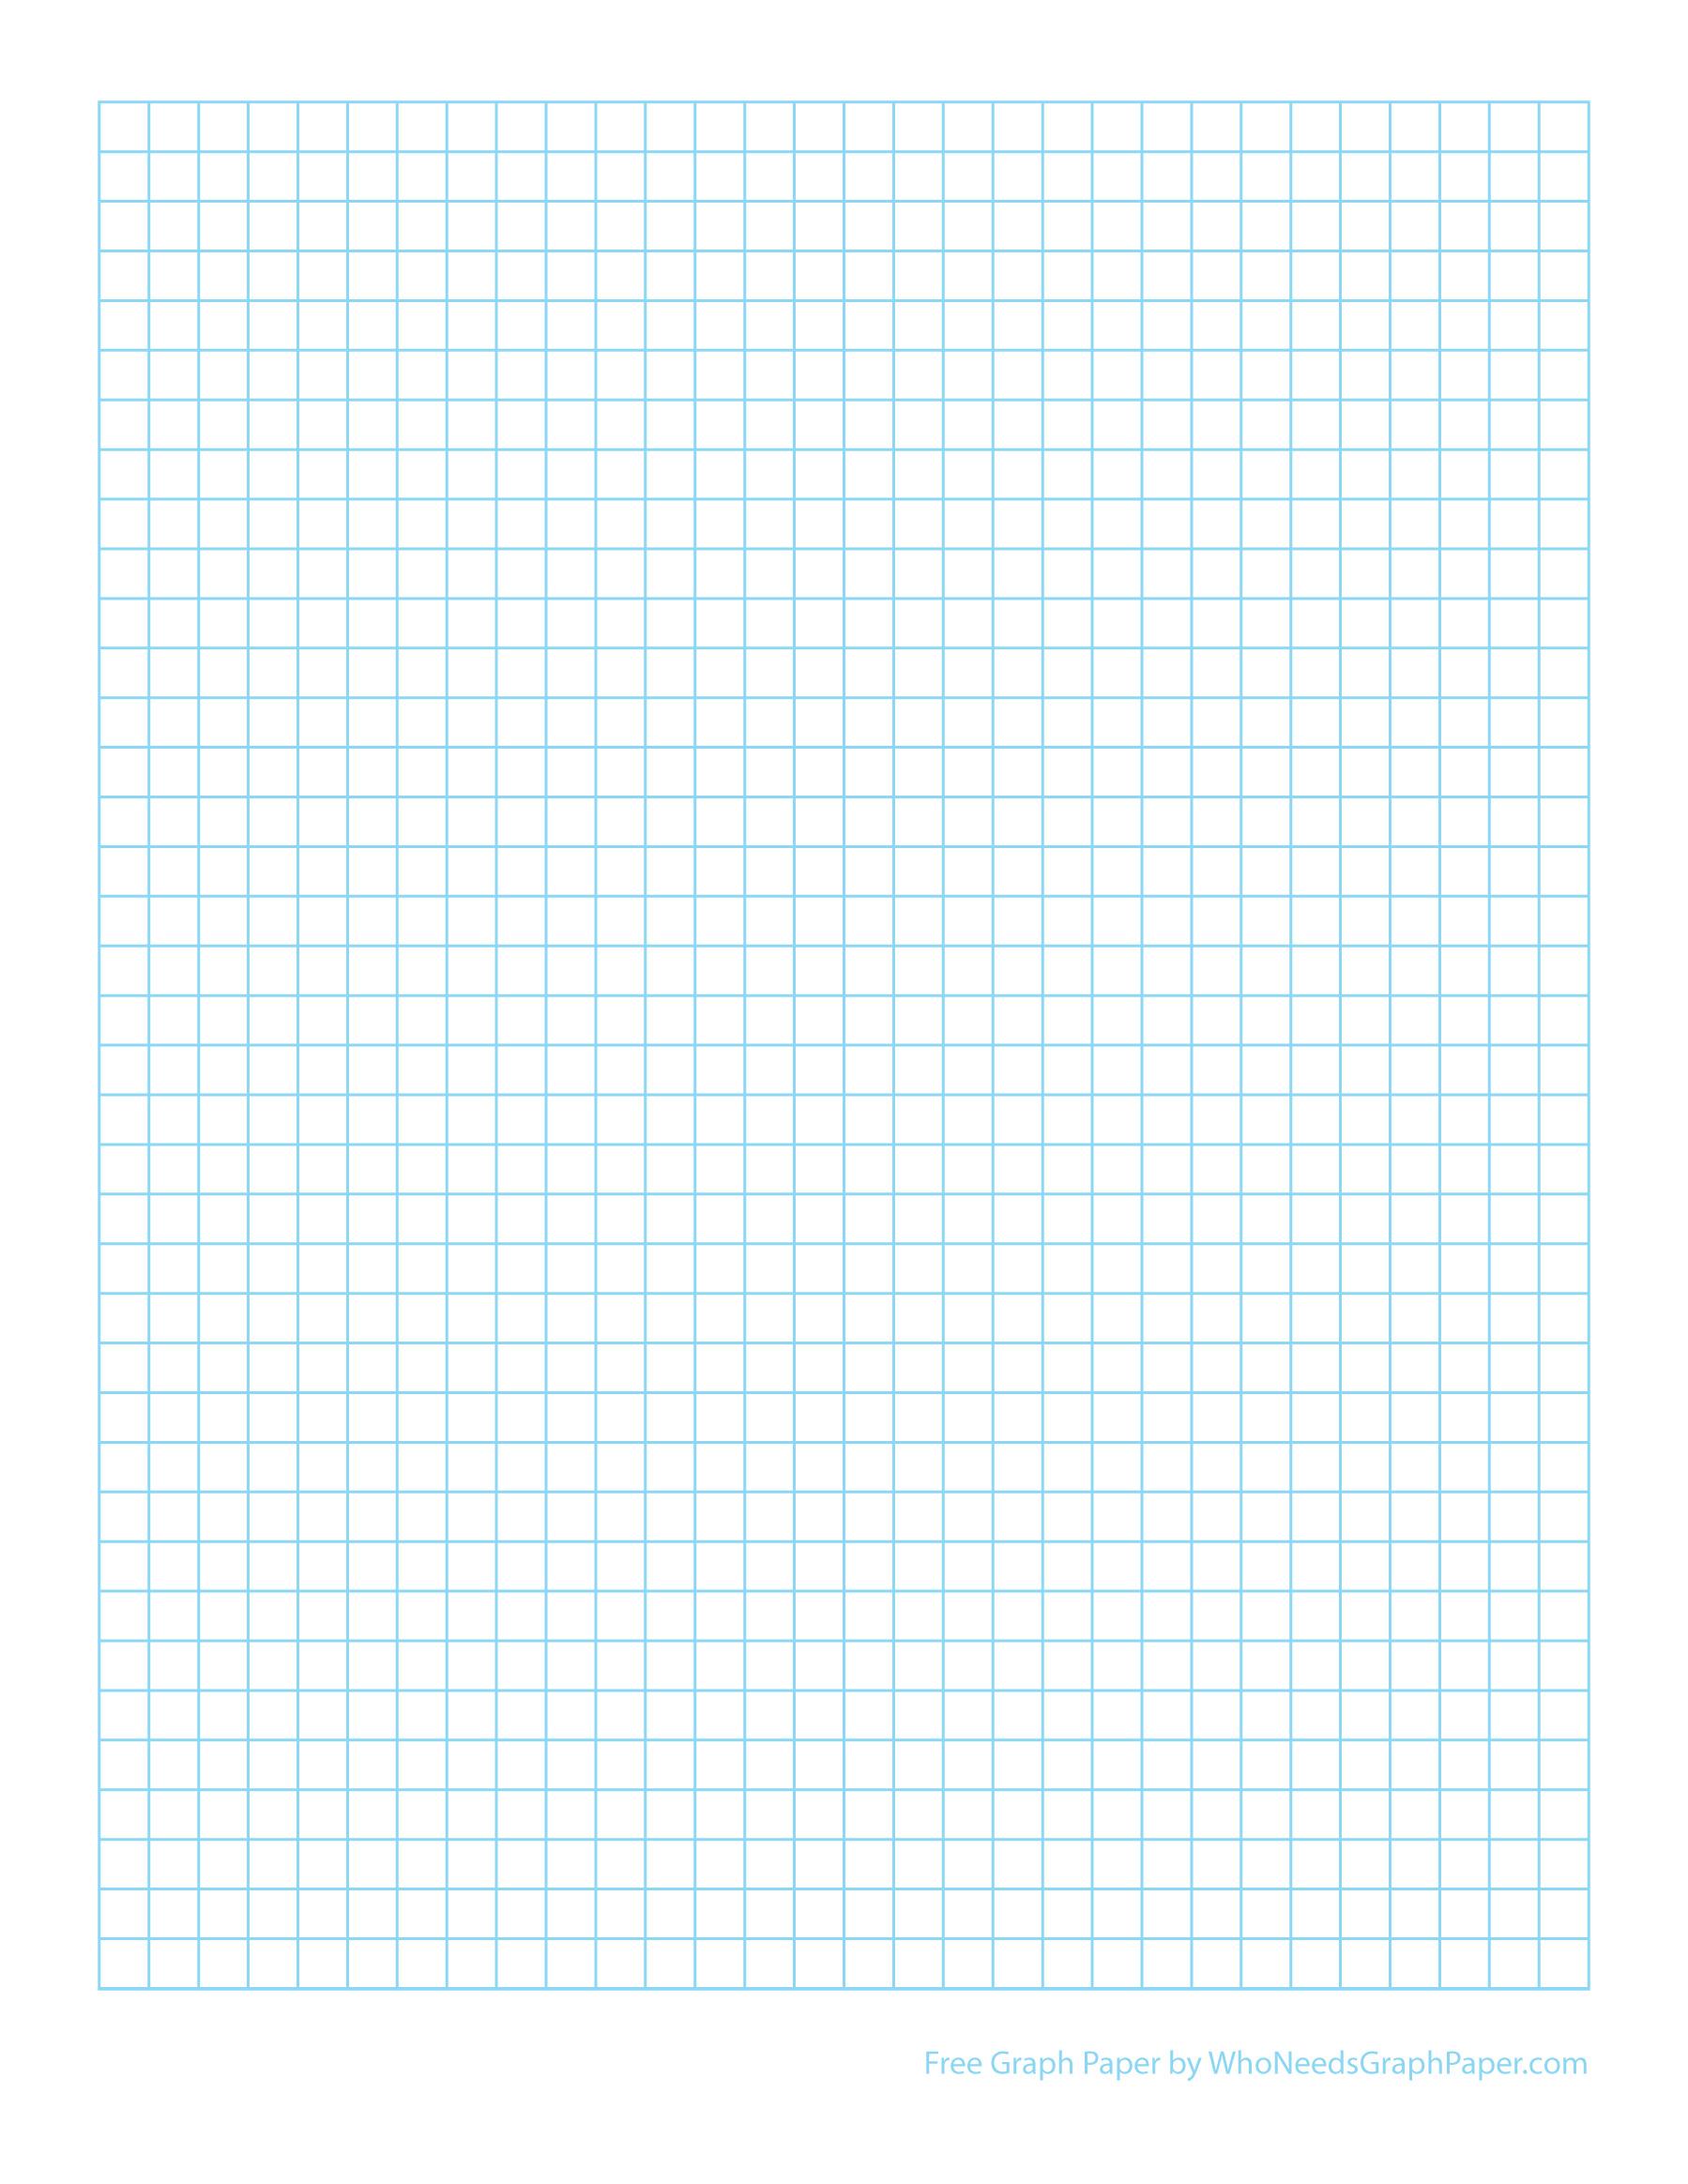 free graph paper